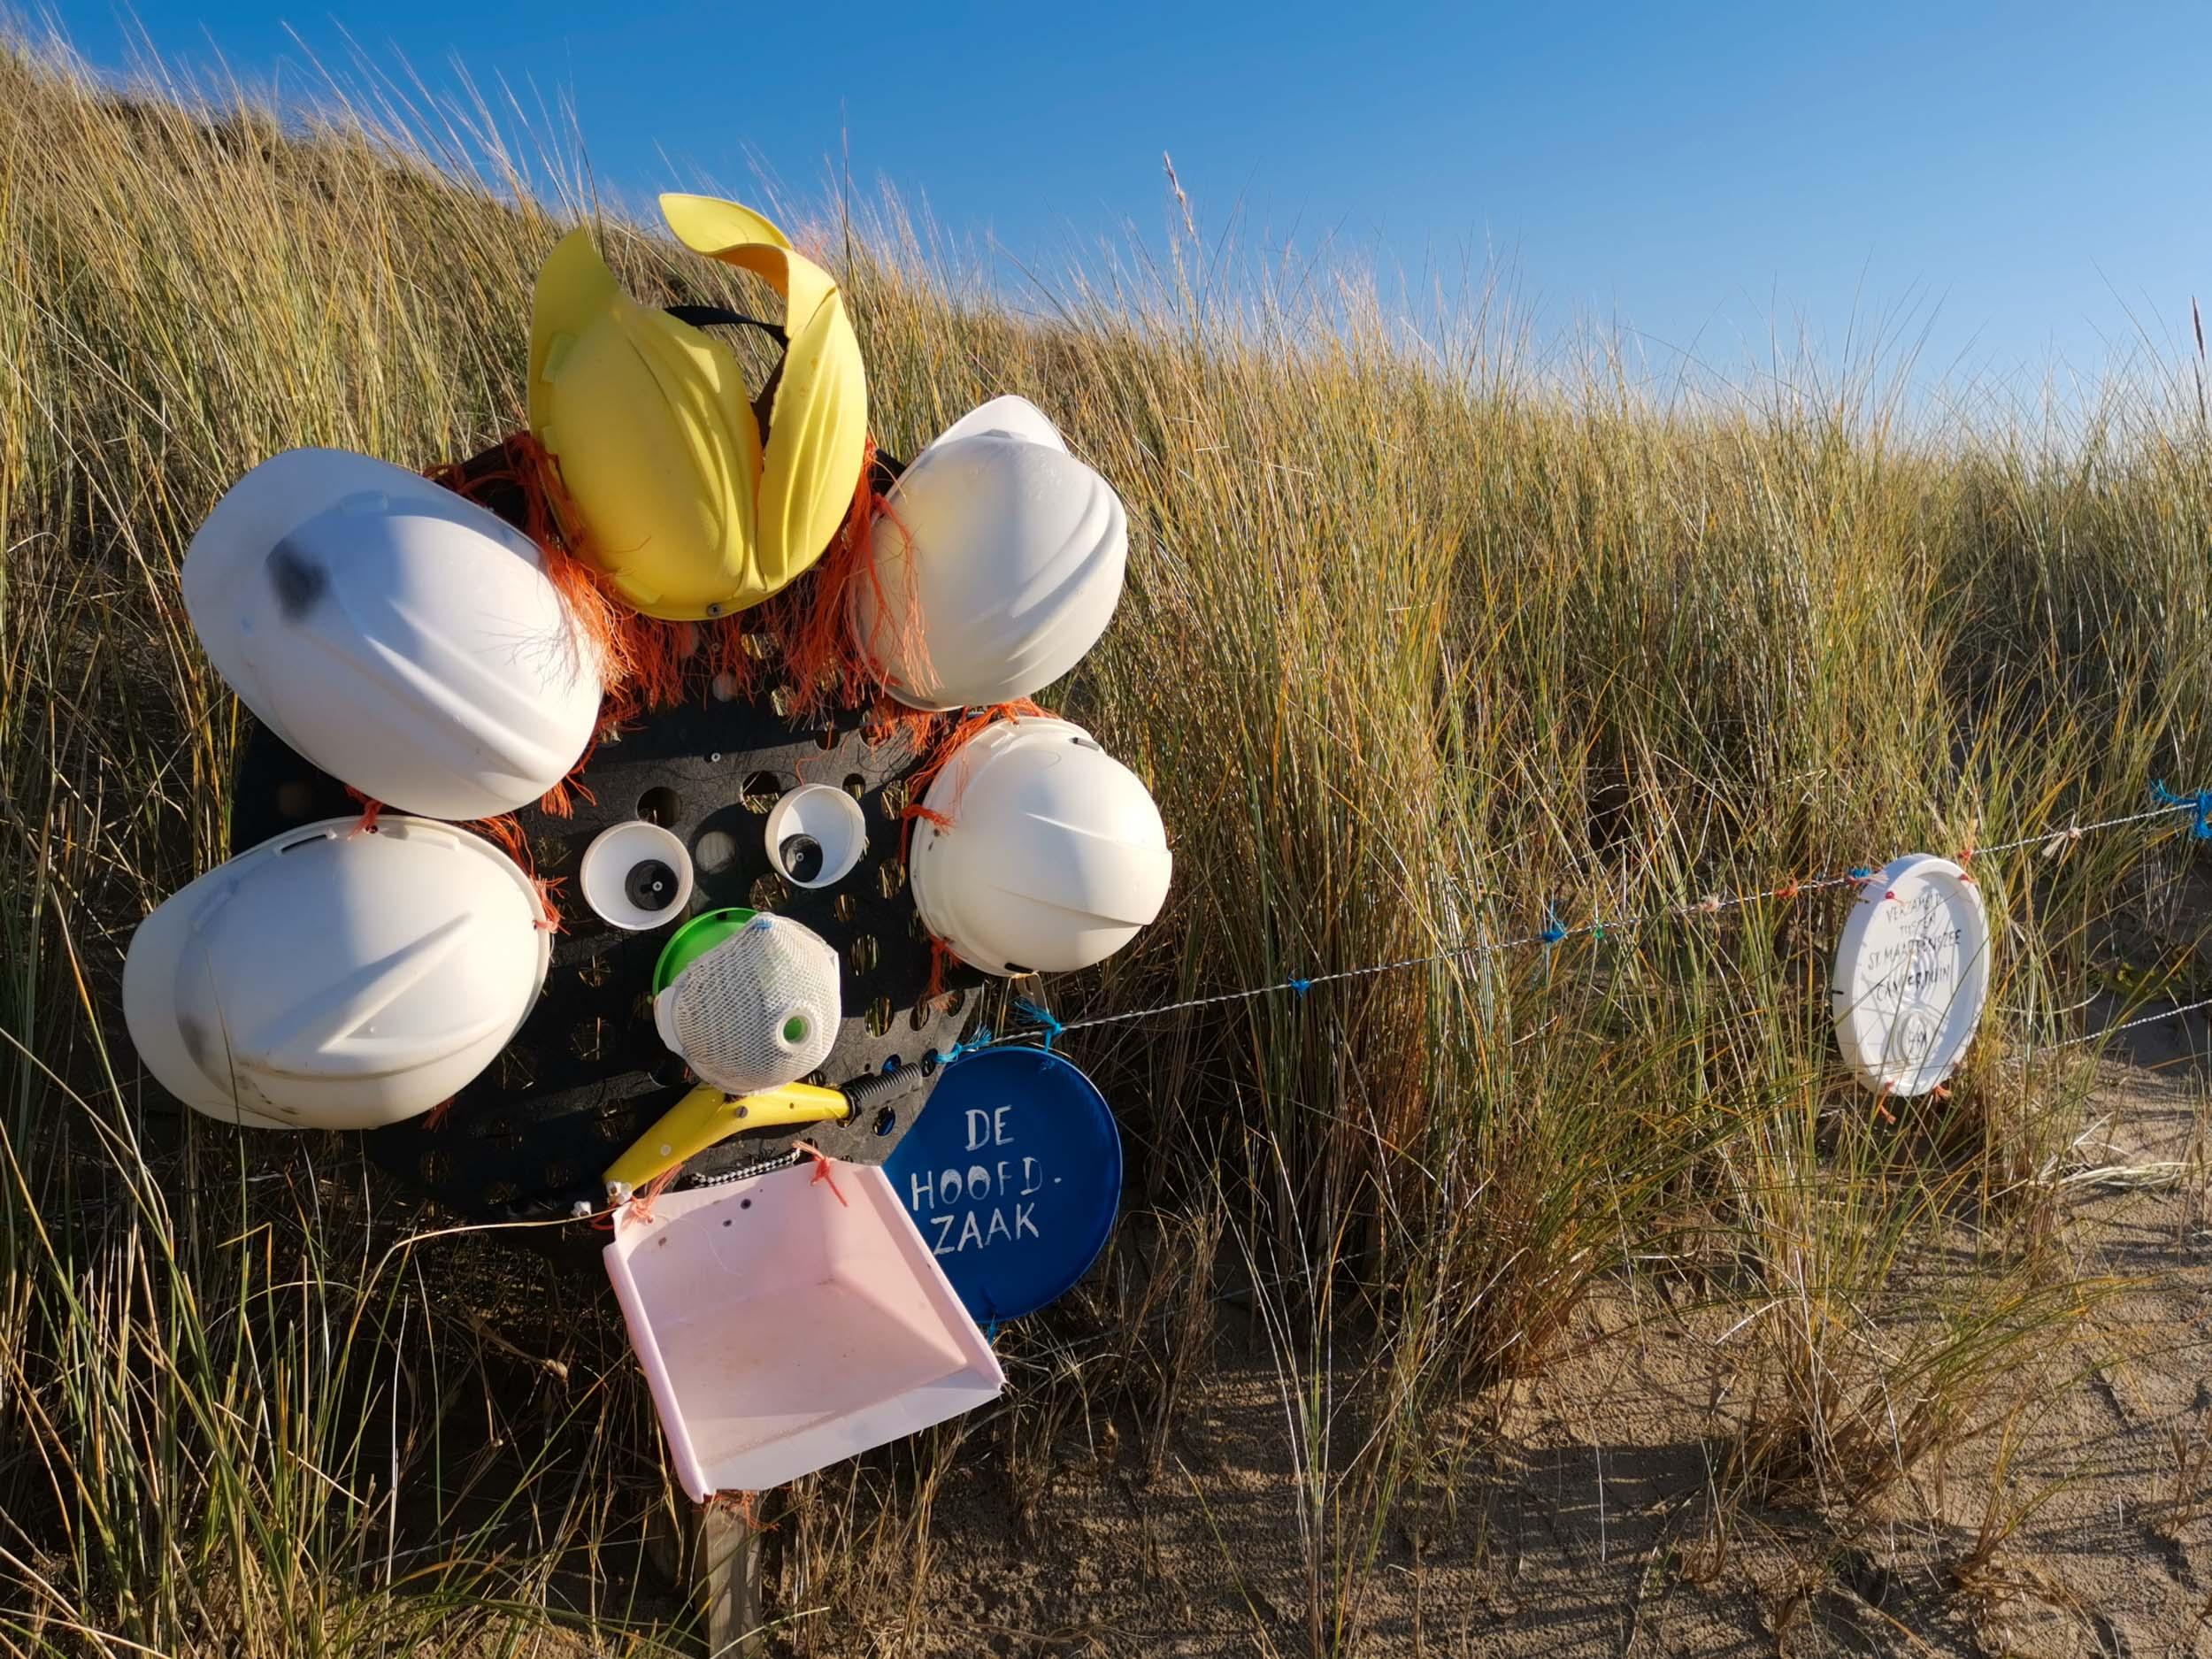 Skulptur aus Strandfunden - Wall of shame